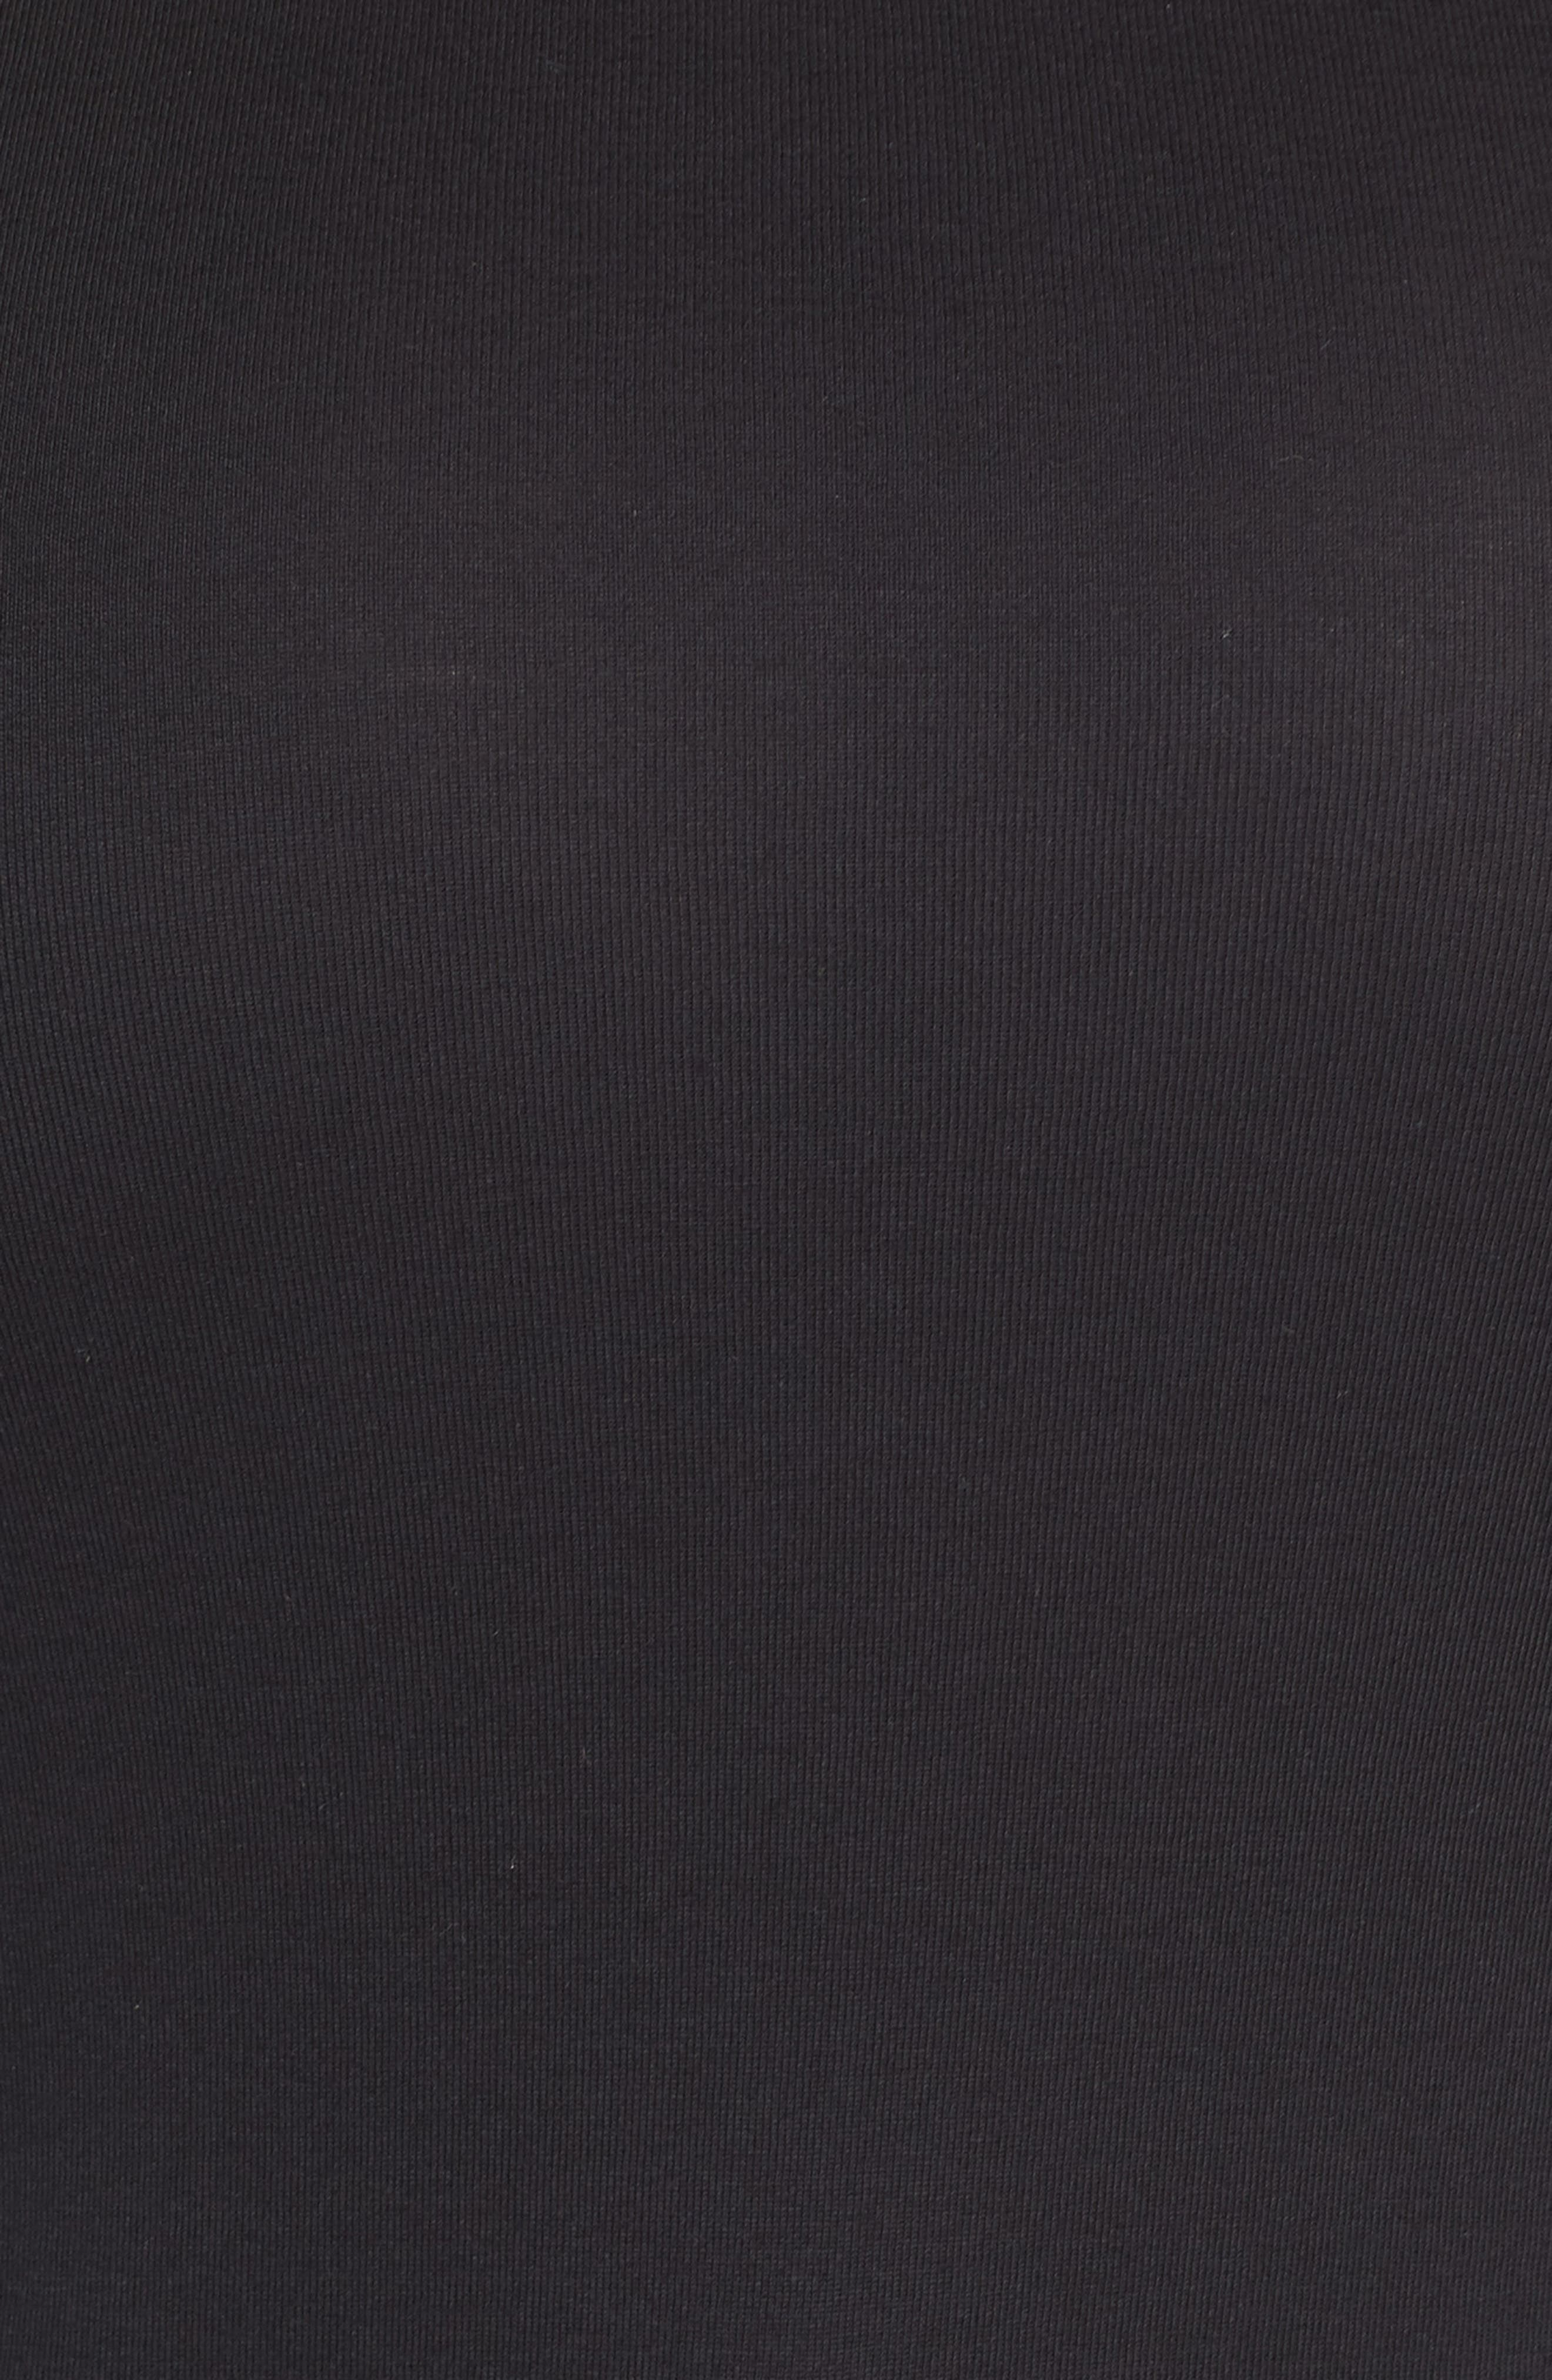 Melody Long Sleeve Scoop Neck Tee,                             Alternate thumbnail 5, color,                             BLACK